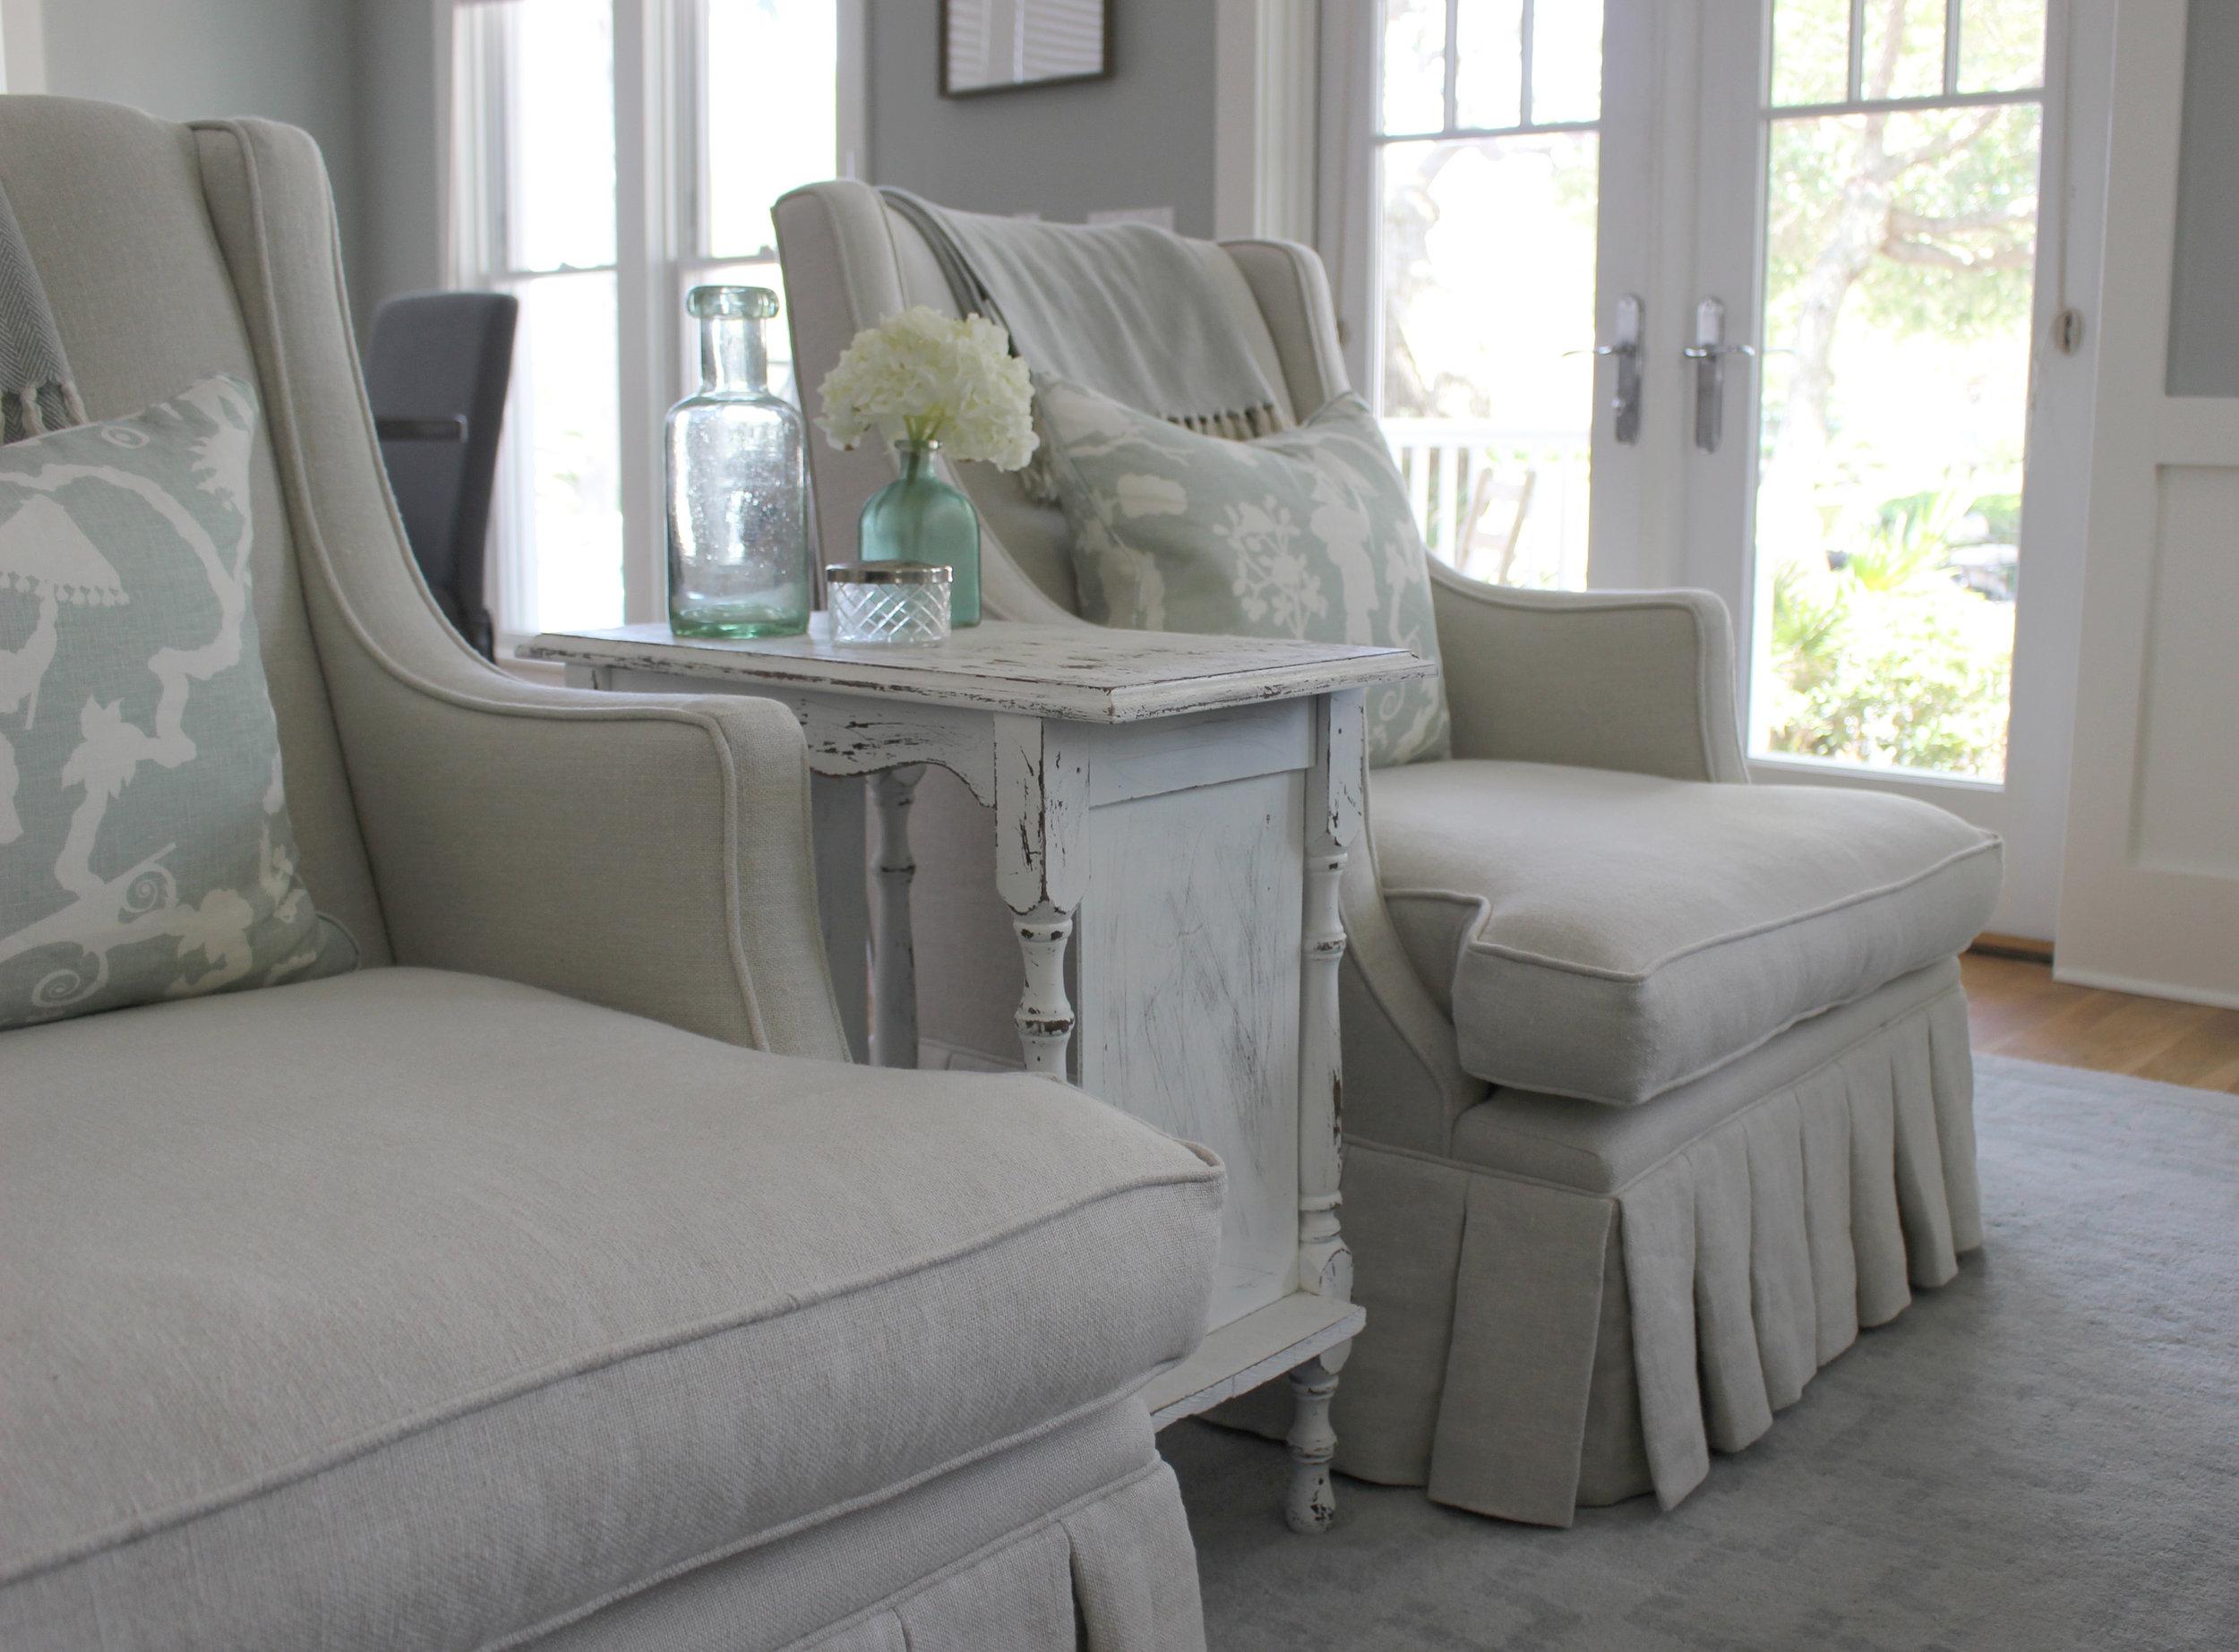 linda chairs.jpg